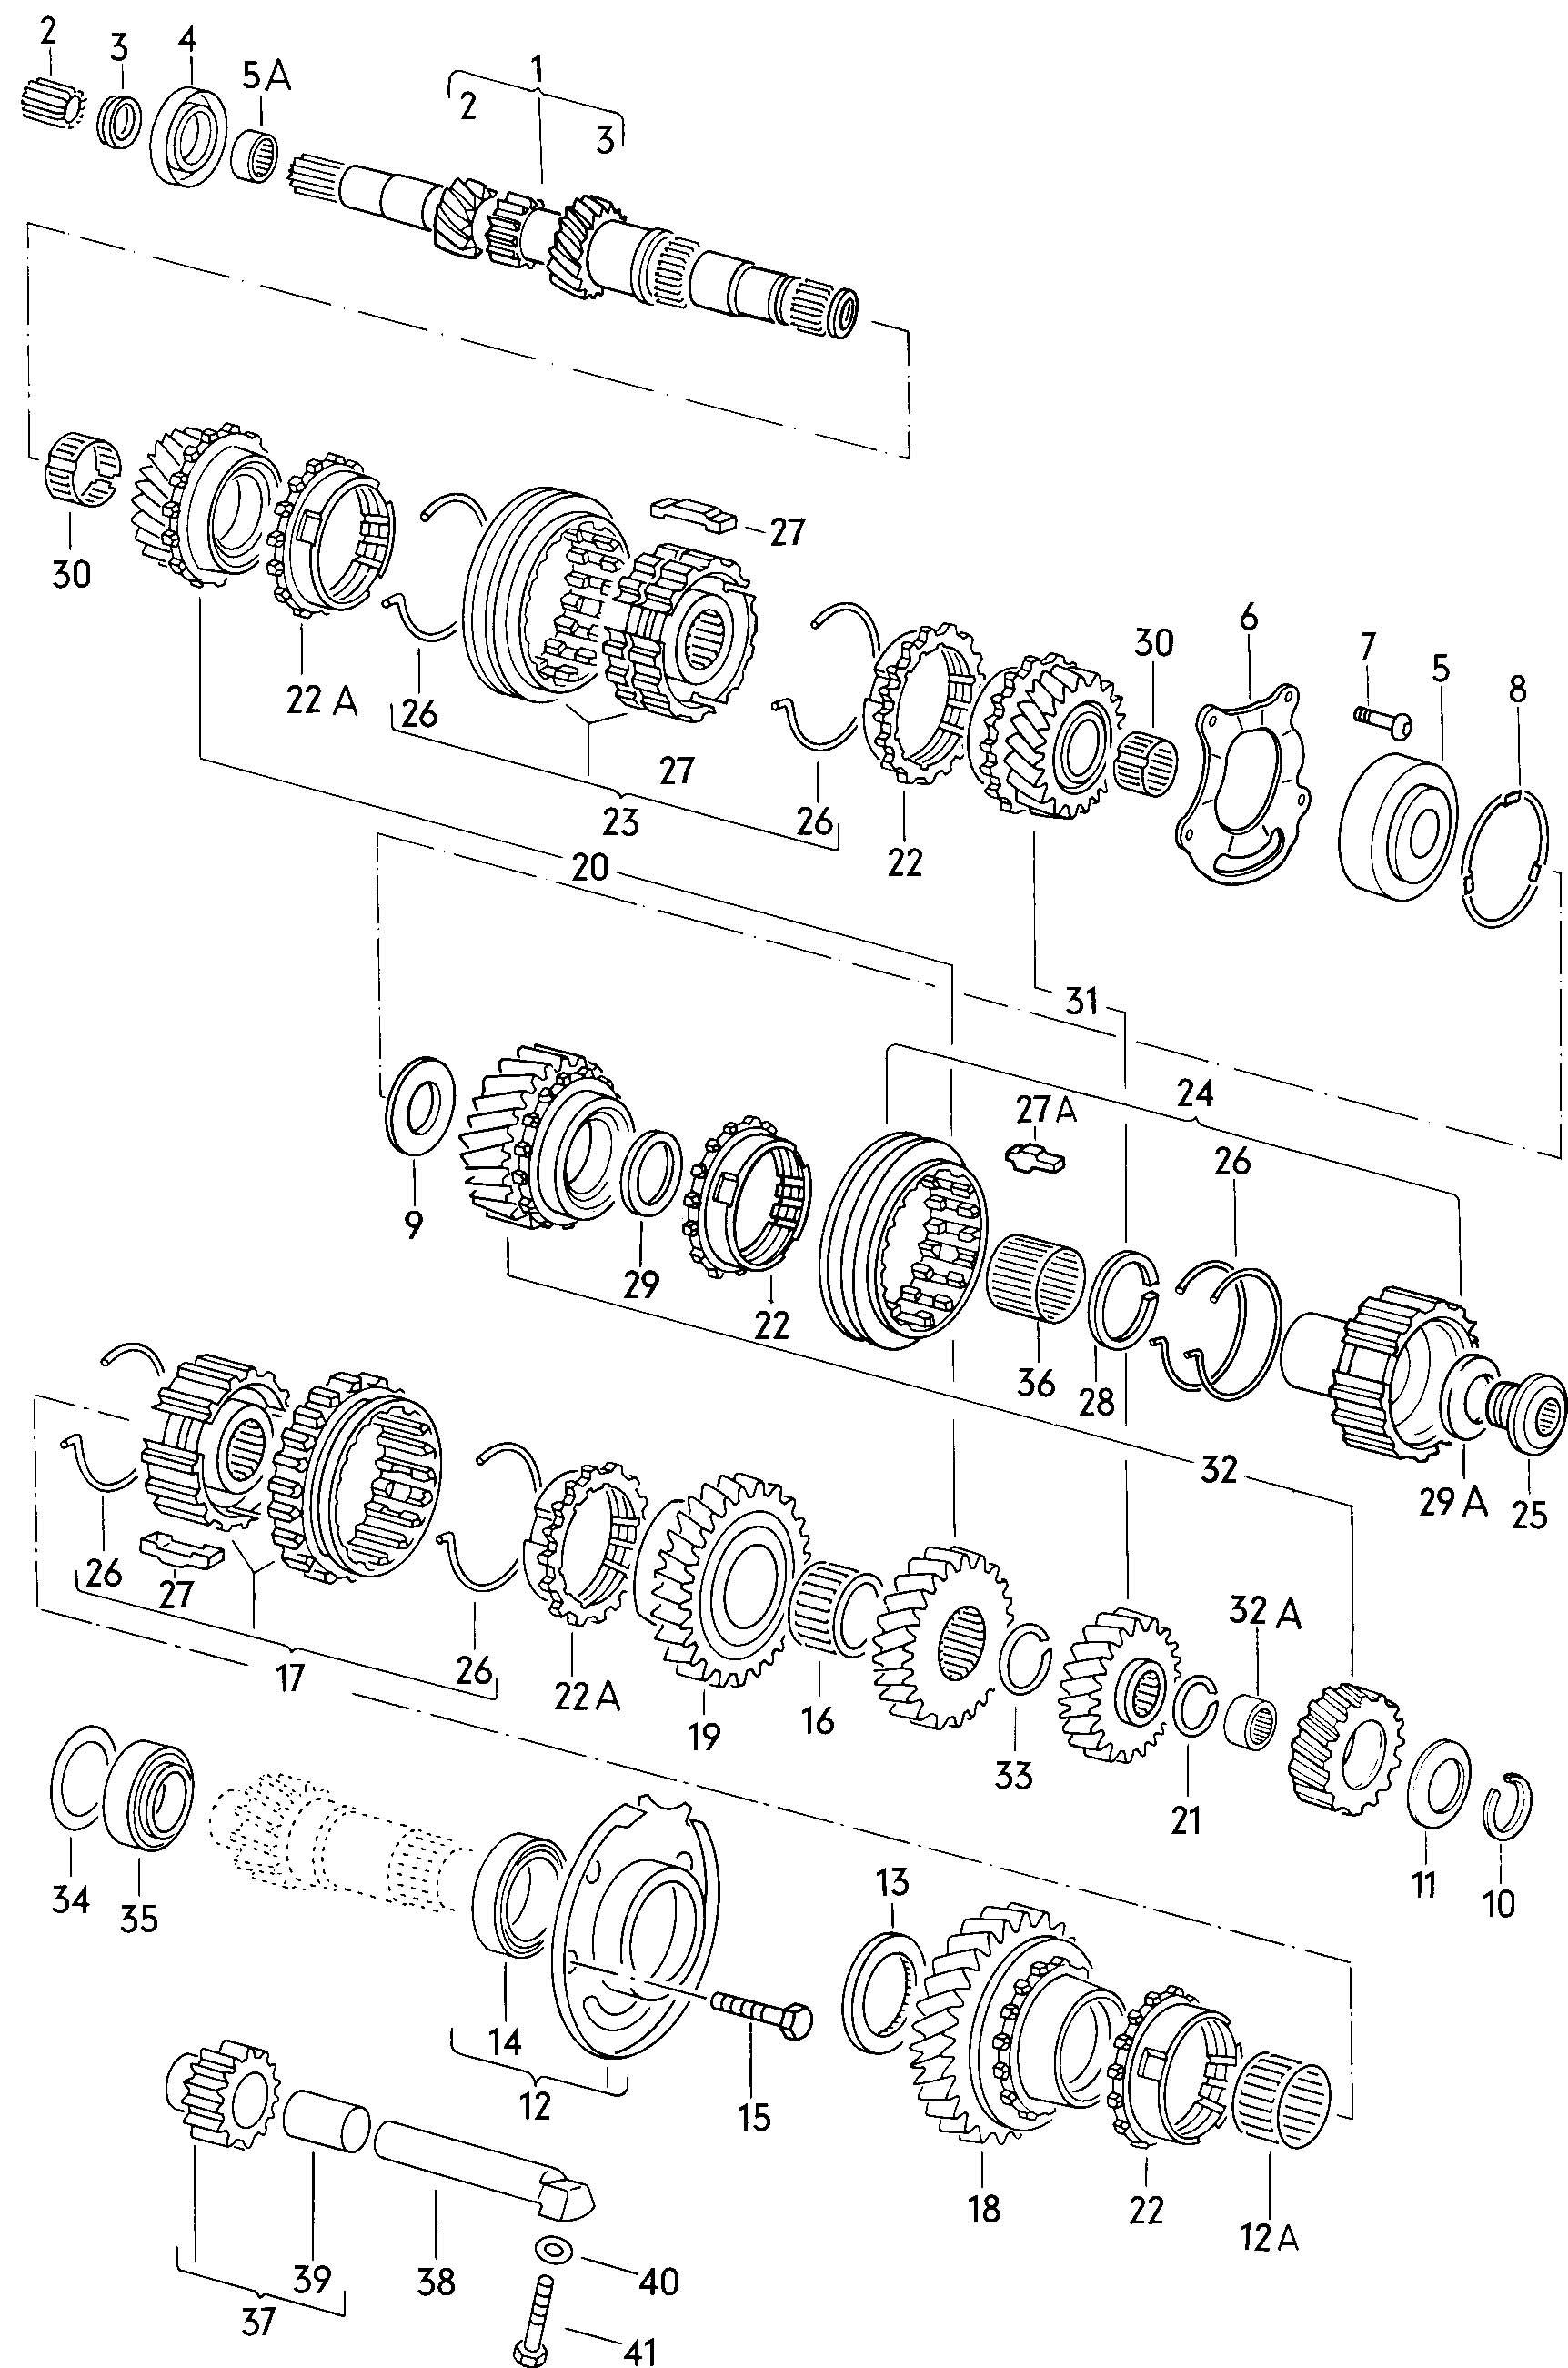 Volkswagen Scirocco Reverse gear. BACK UP GEAR